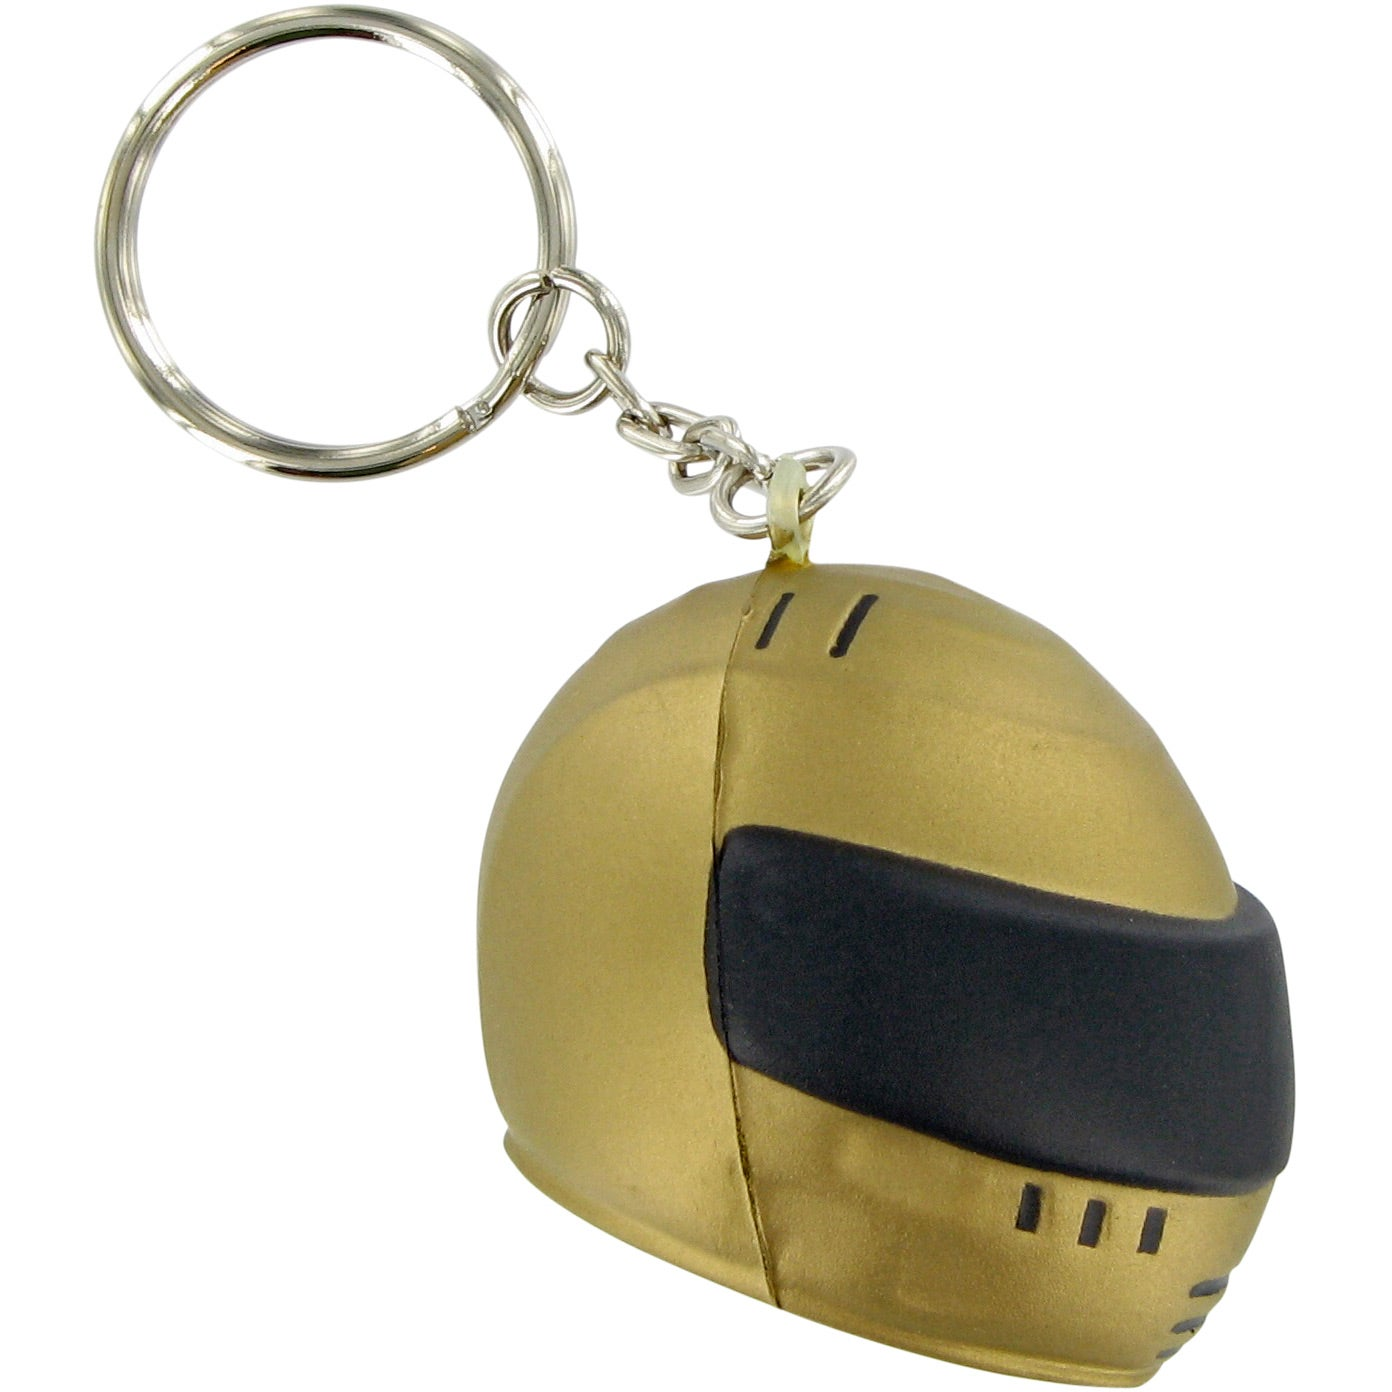 Racing Helmet Keychain Stress Toy